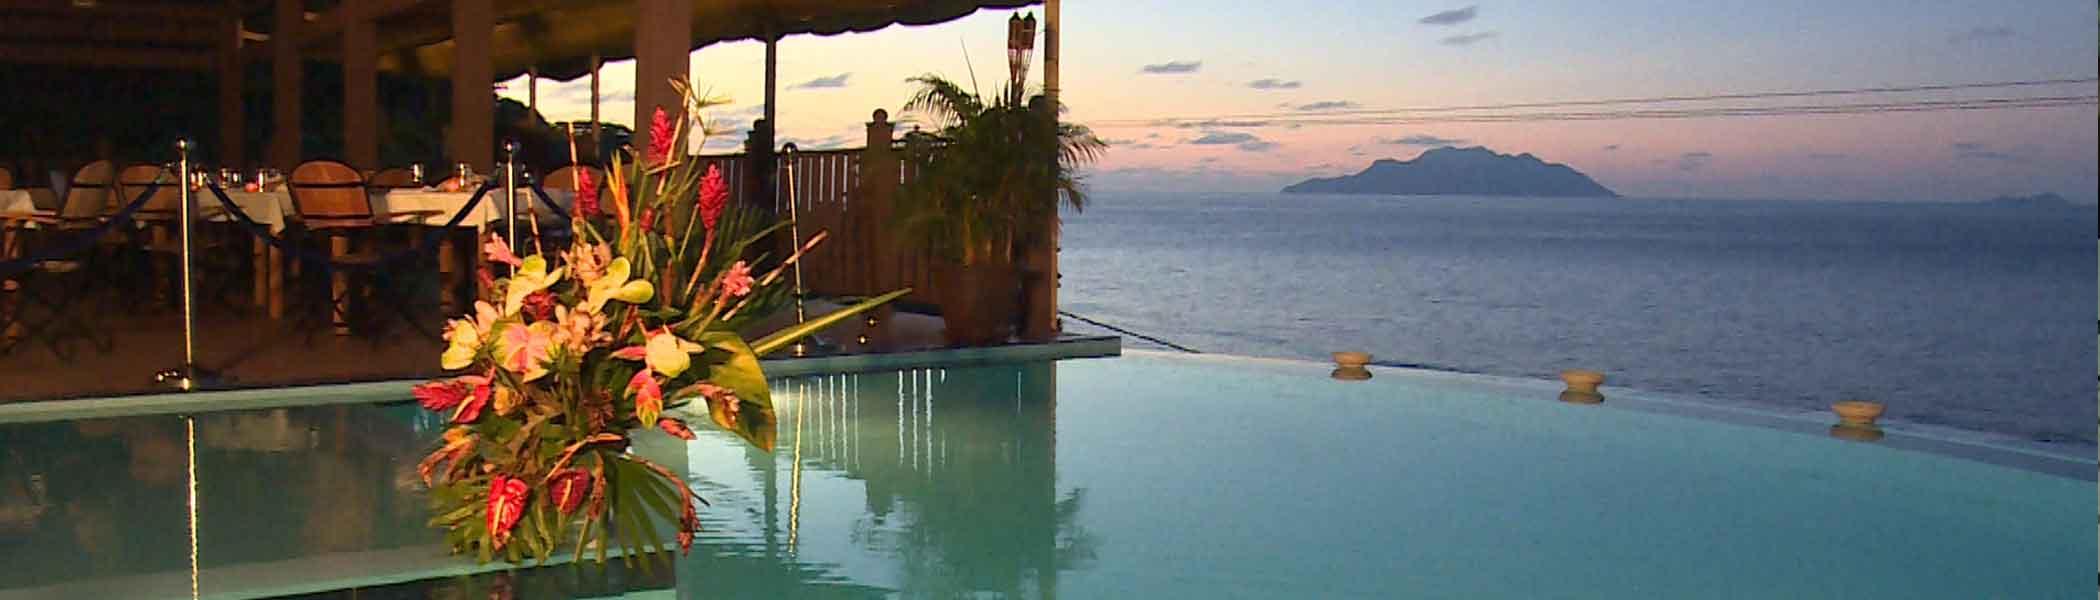 treasure-cove, Hotels in Seychelles Islands